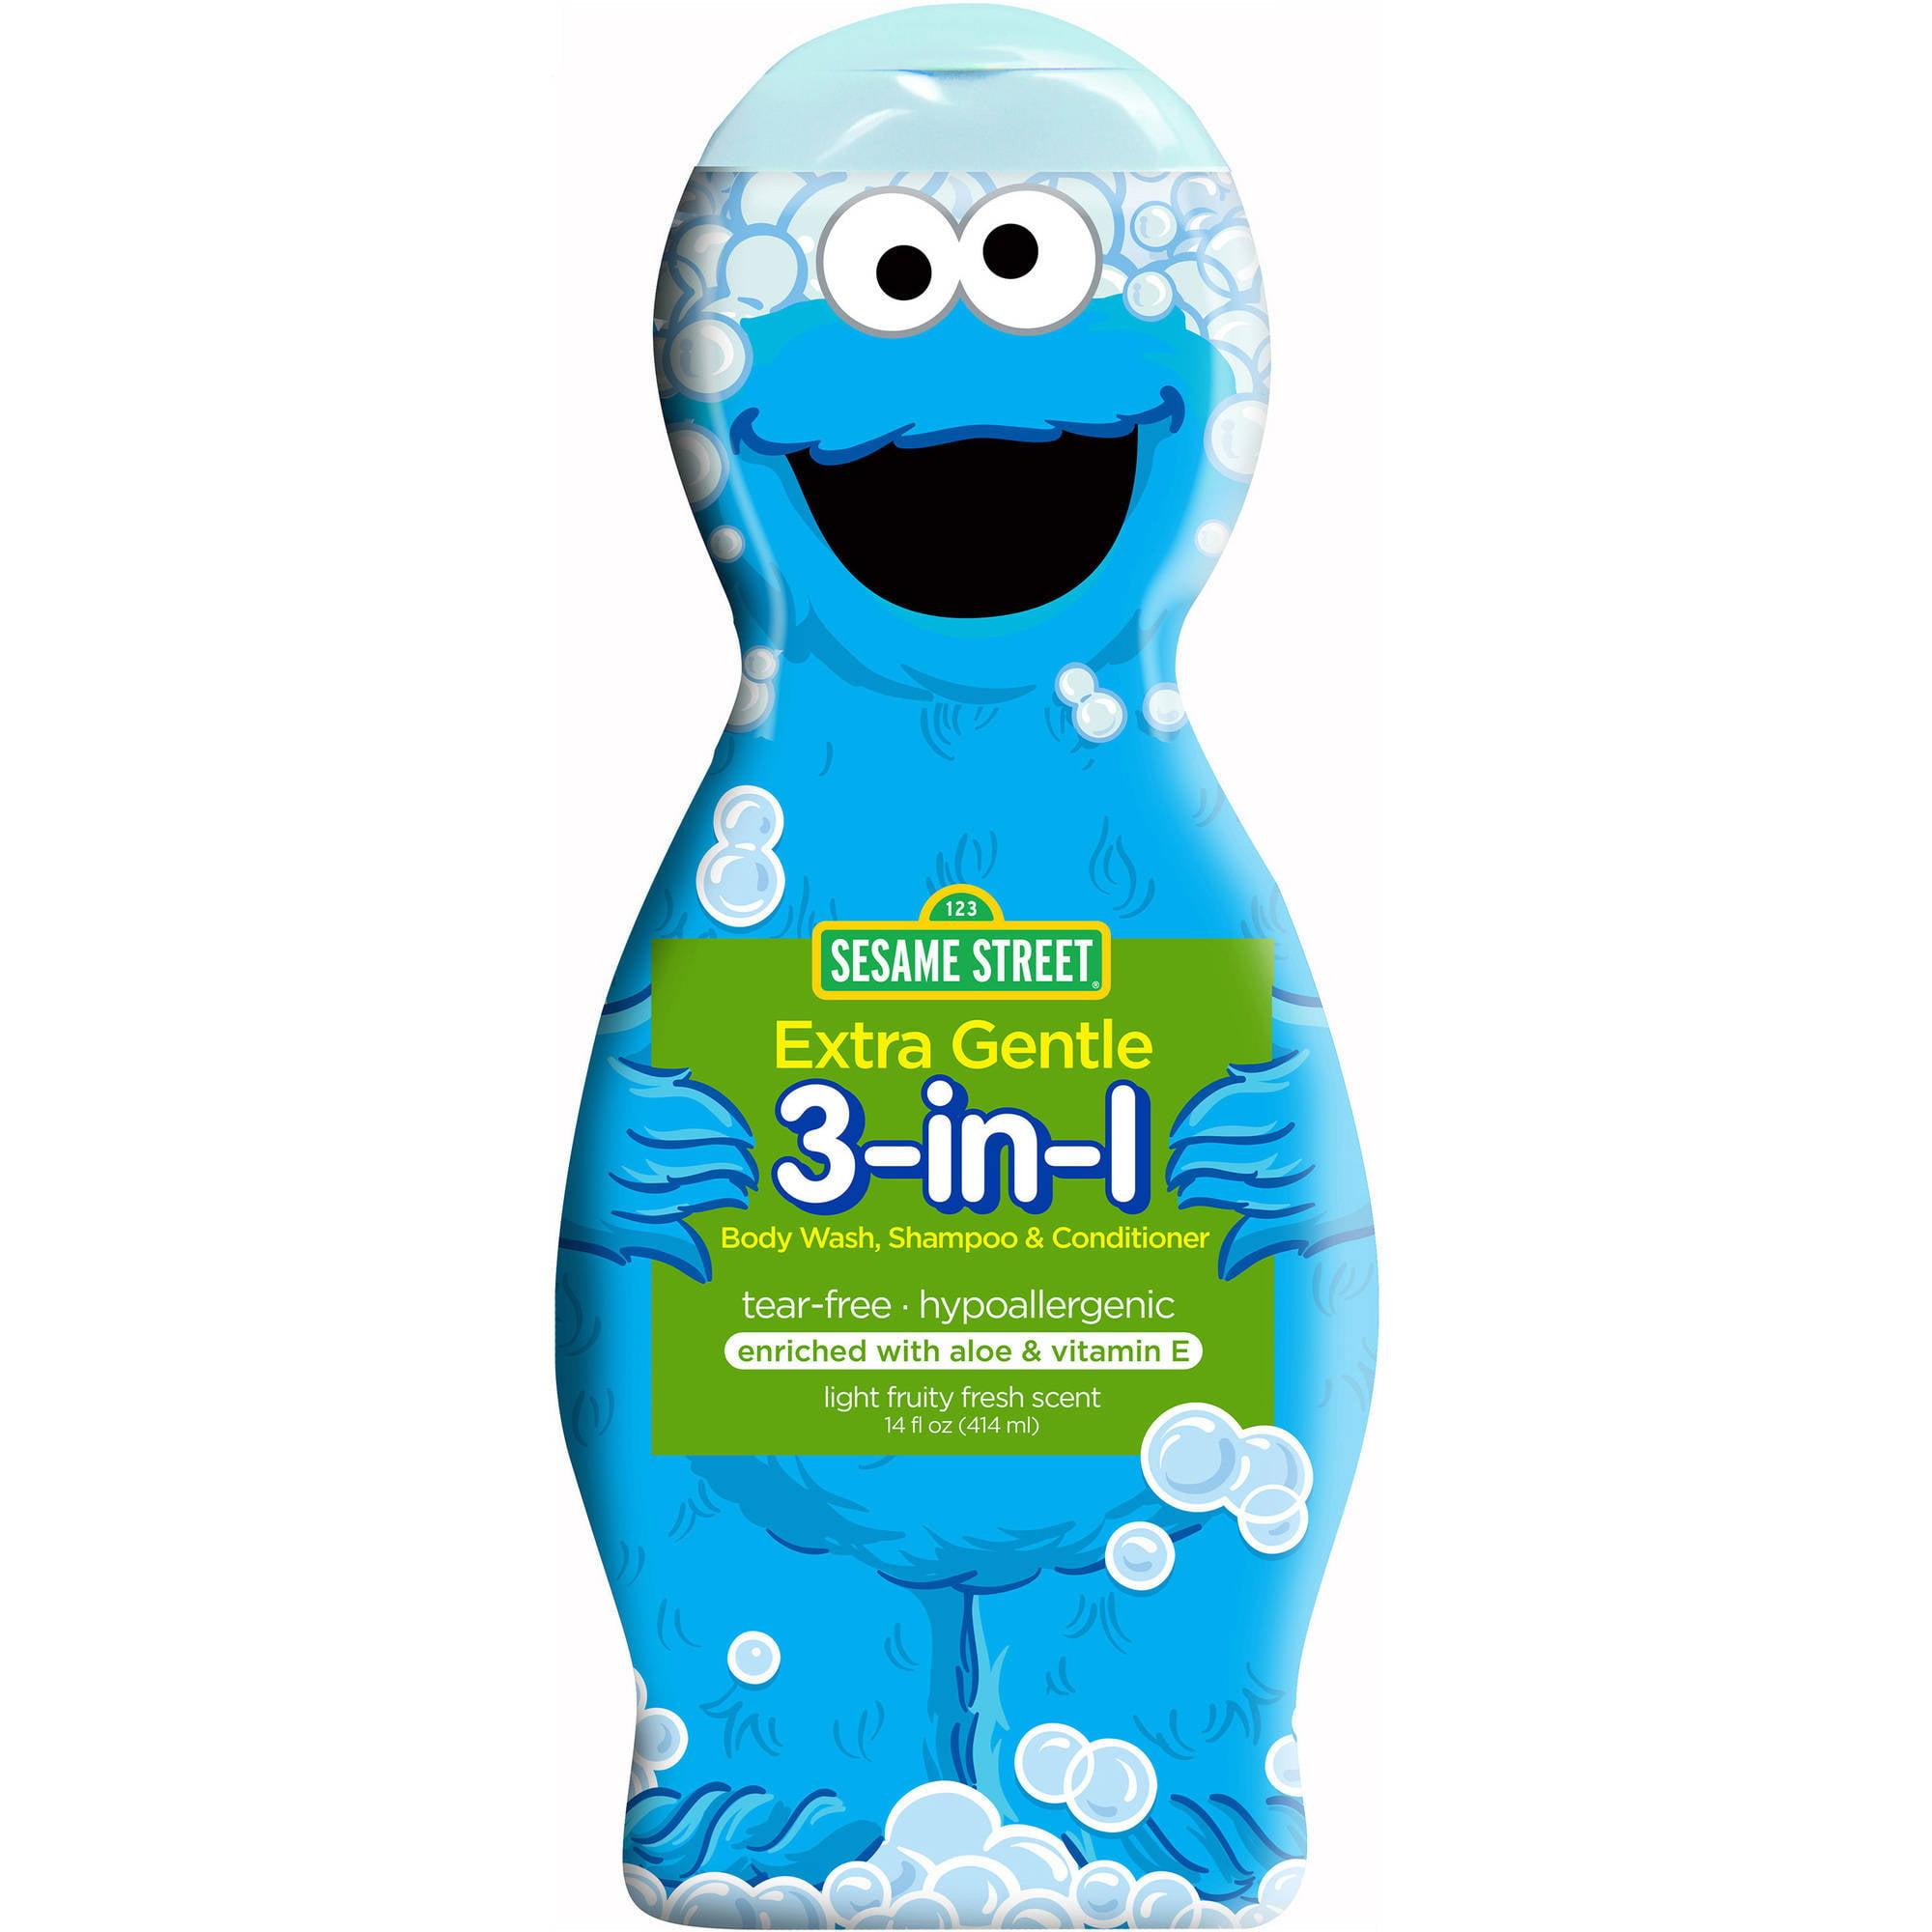 Sesame Street Extra Sensitive 3-in-1 Body Wash, Shampoo & Conditioner, 14 fl oz